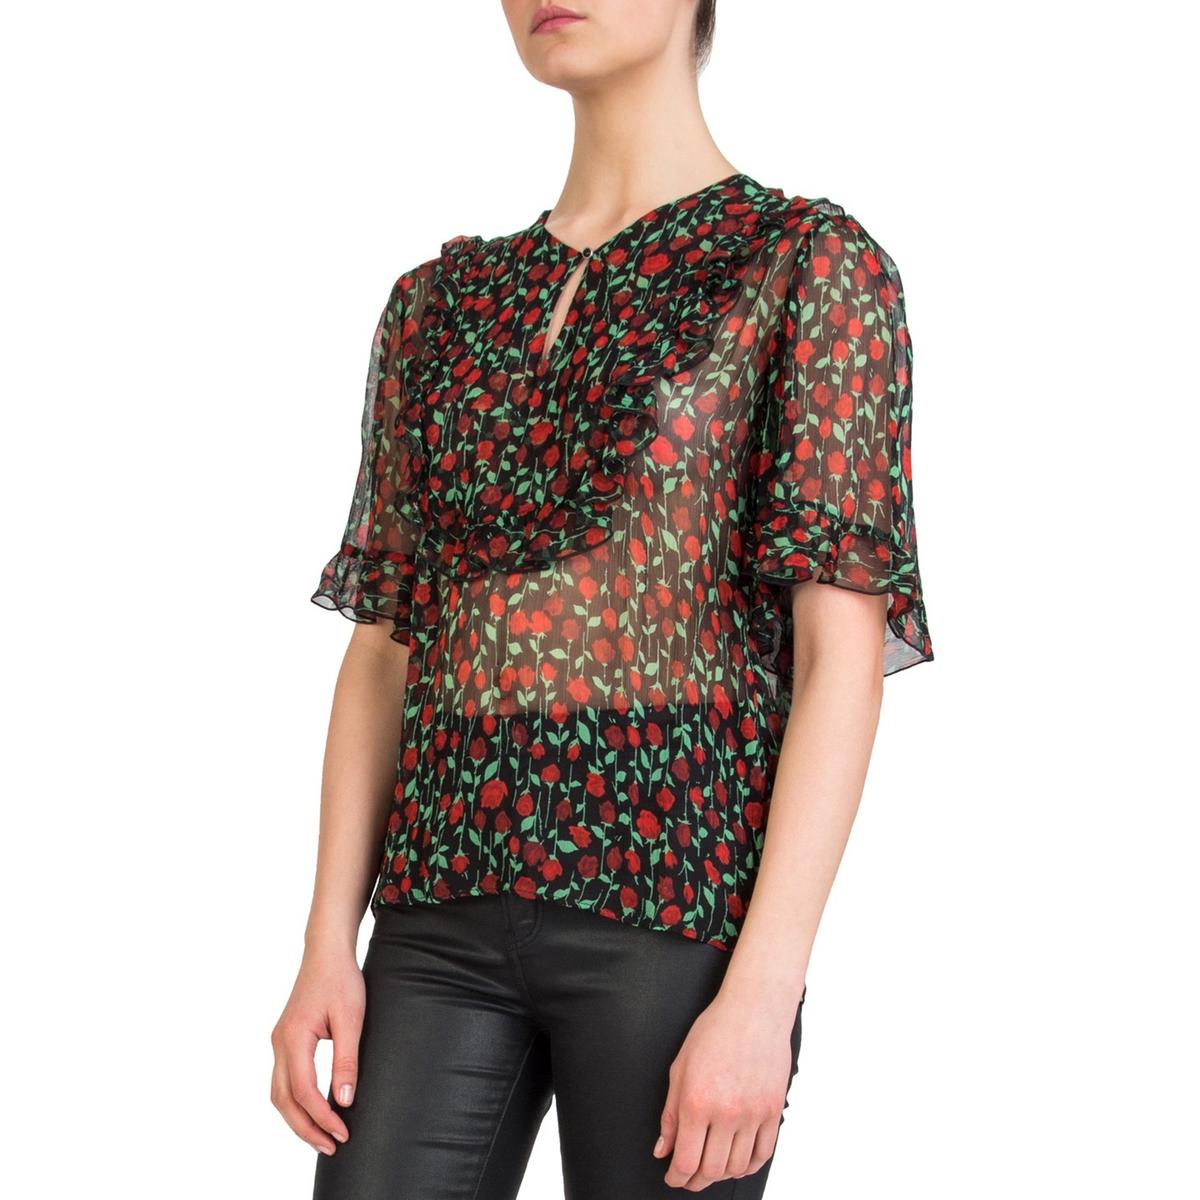 Блузка с рисунком, воланами и короткими рукавами